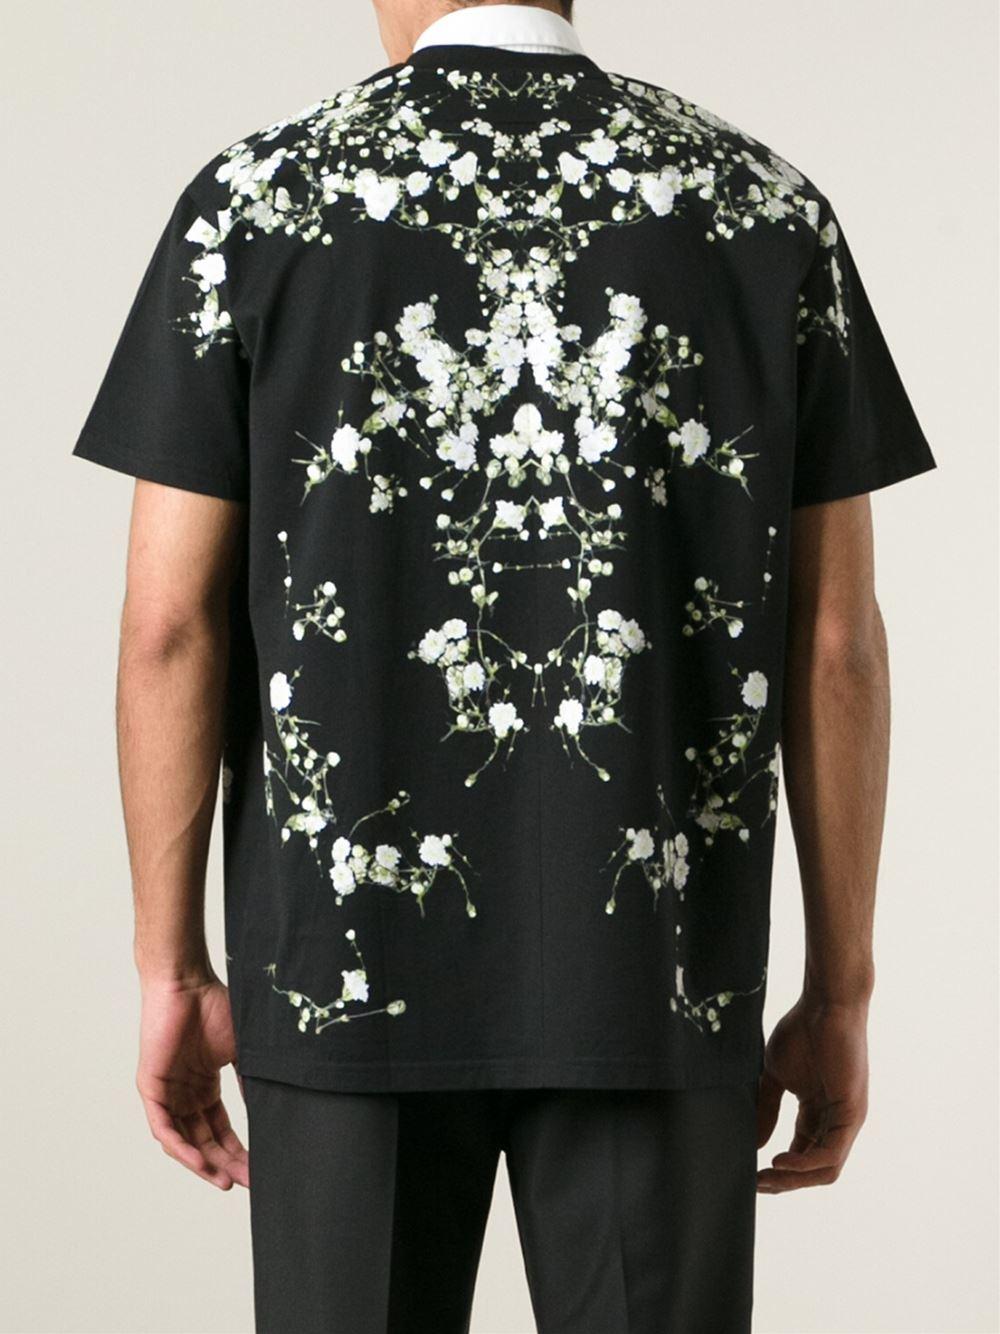 givenchy columbian fit floral print t shirt in black for men lyst. Black Bedroom Furniture Sets. Home Design Ideas